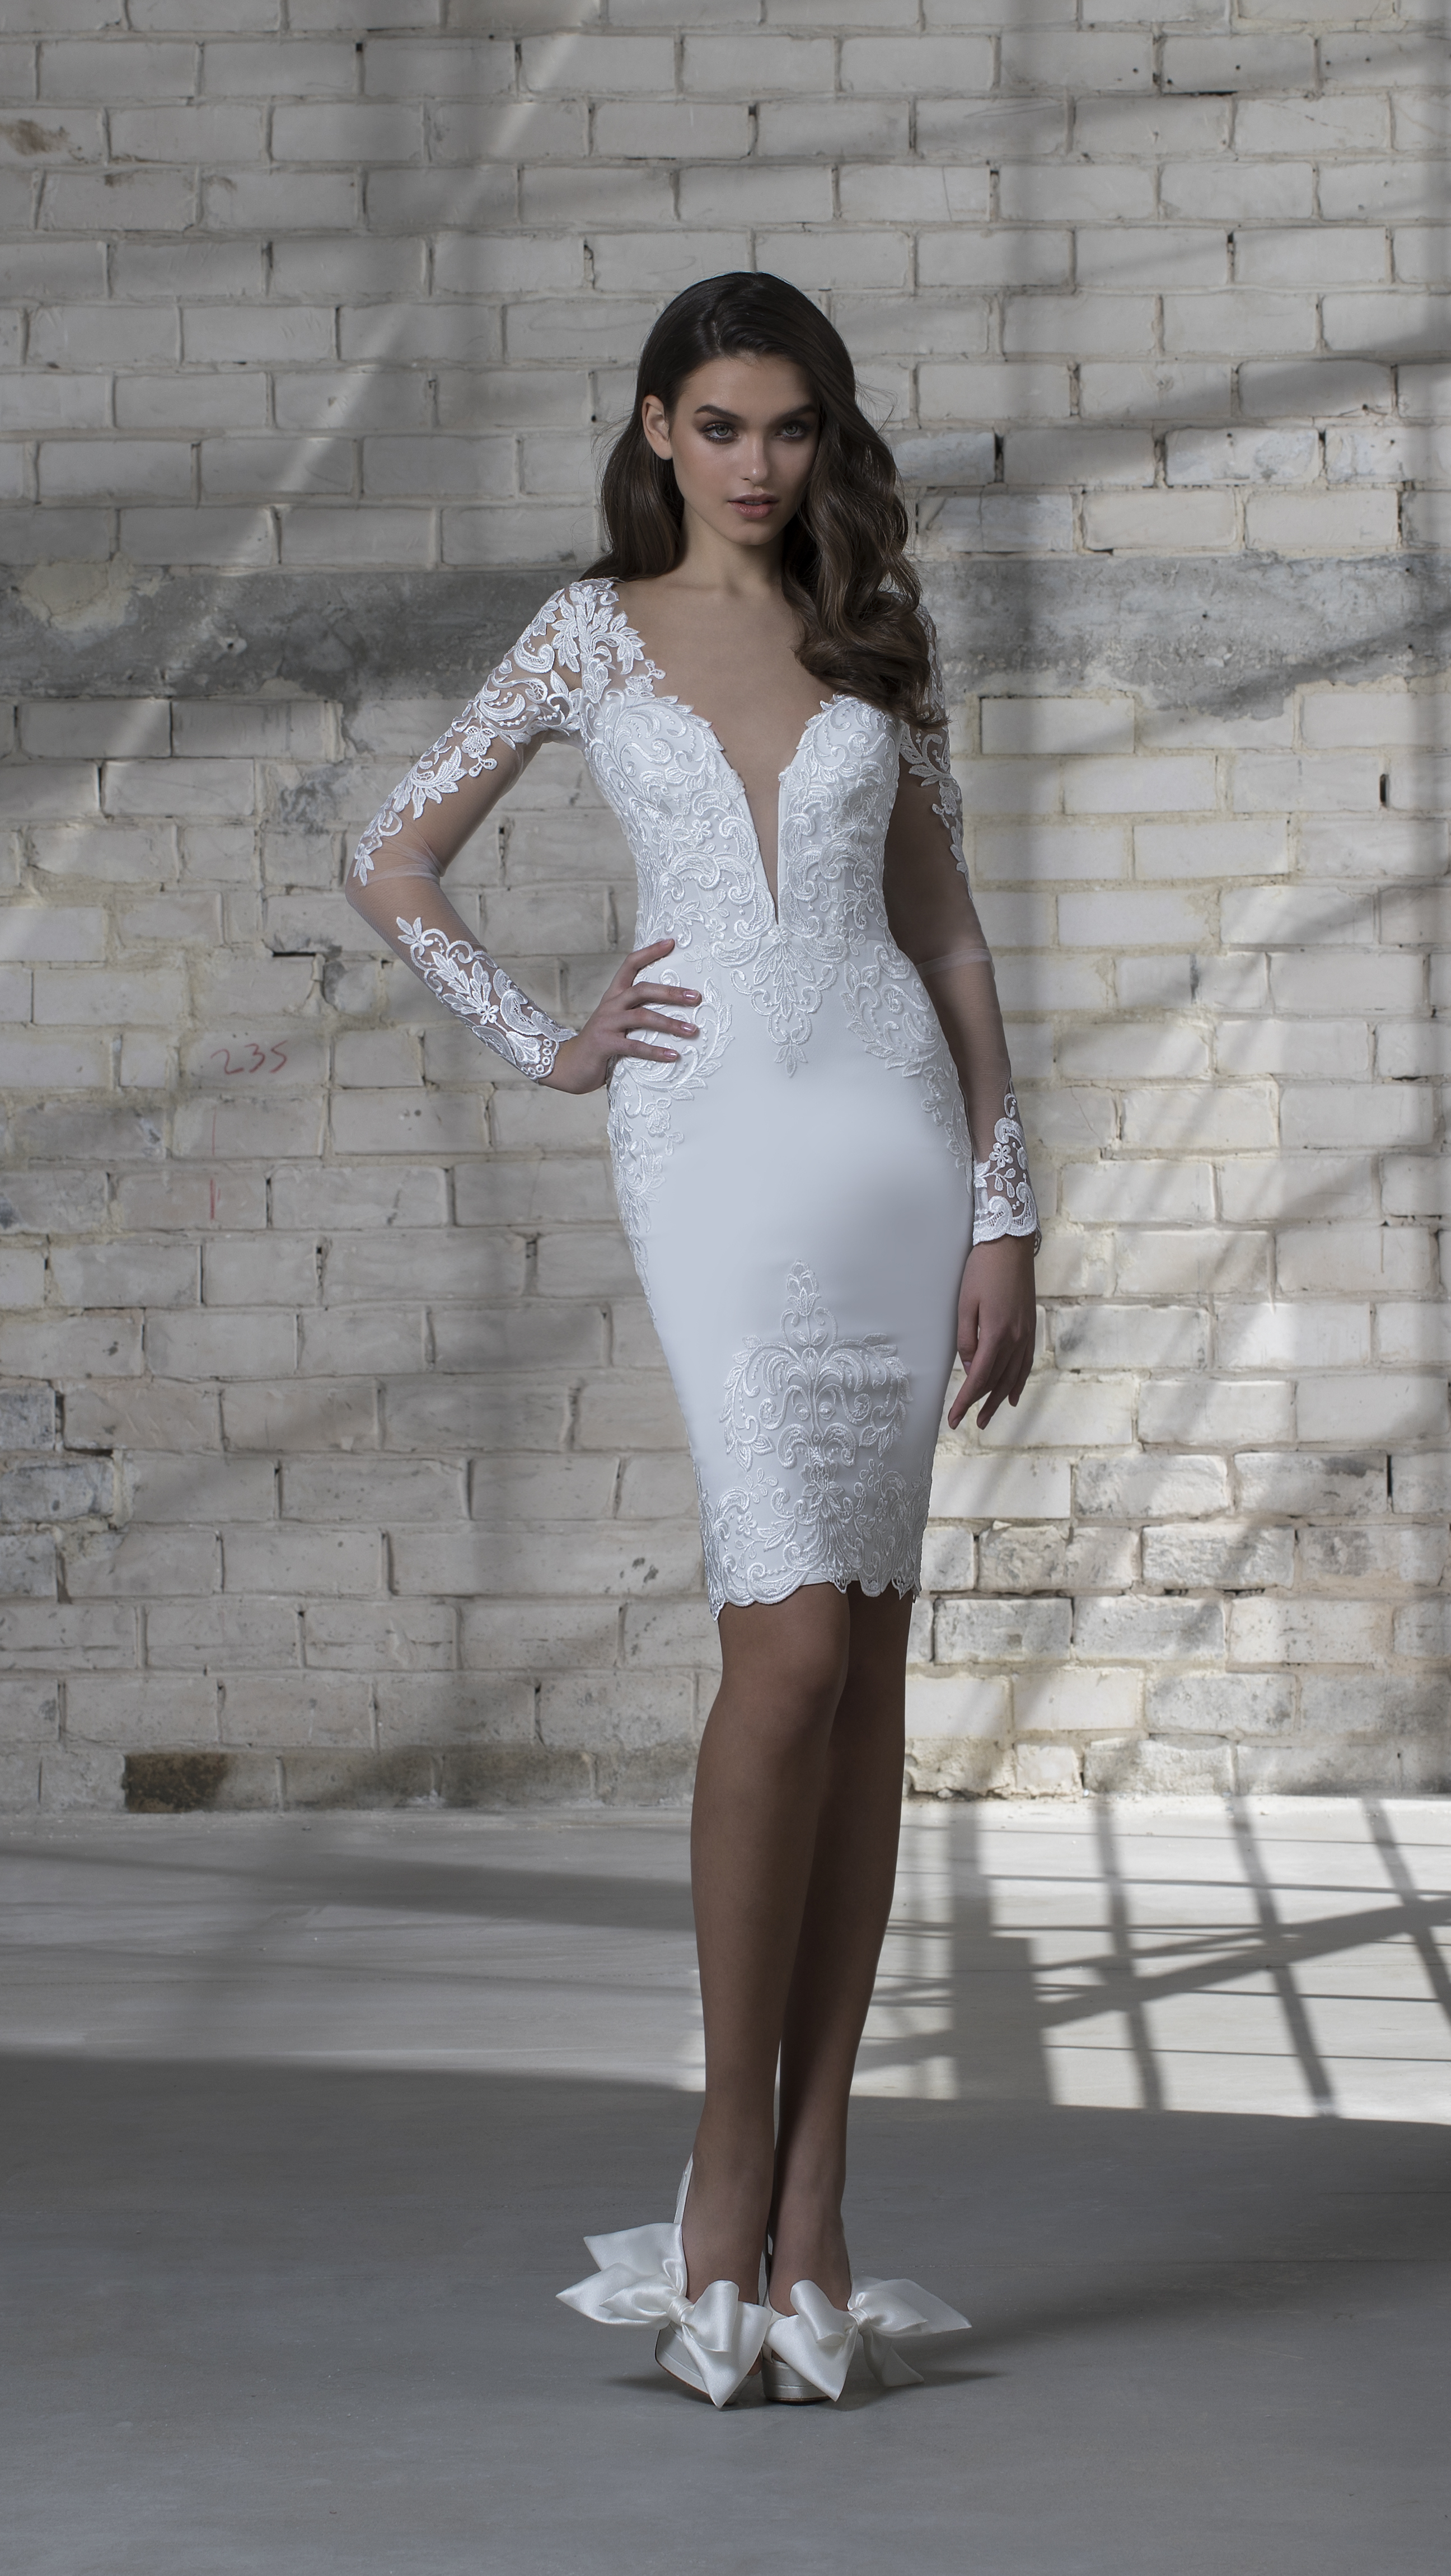 Short Length Dress